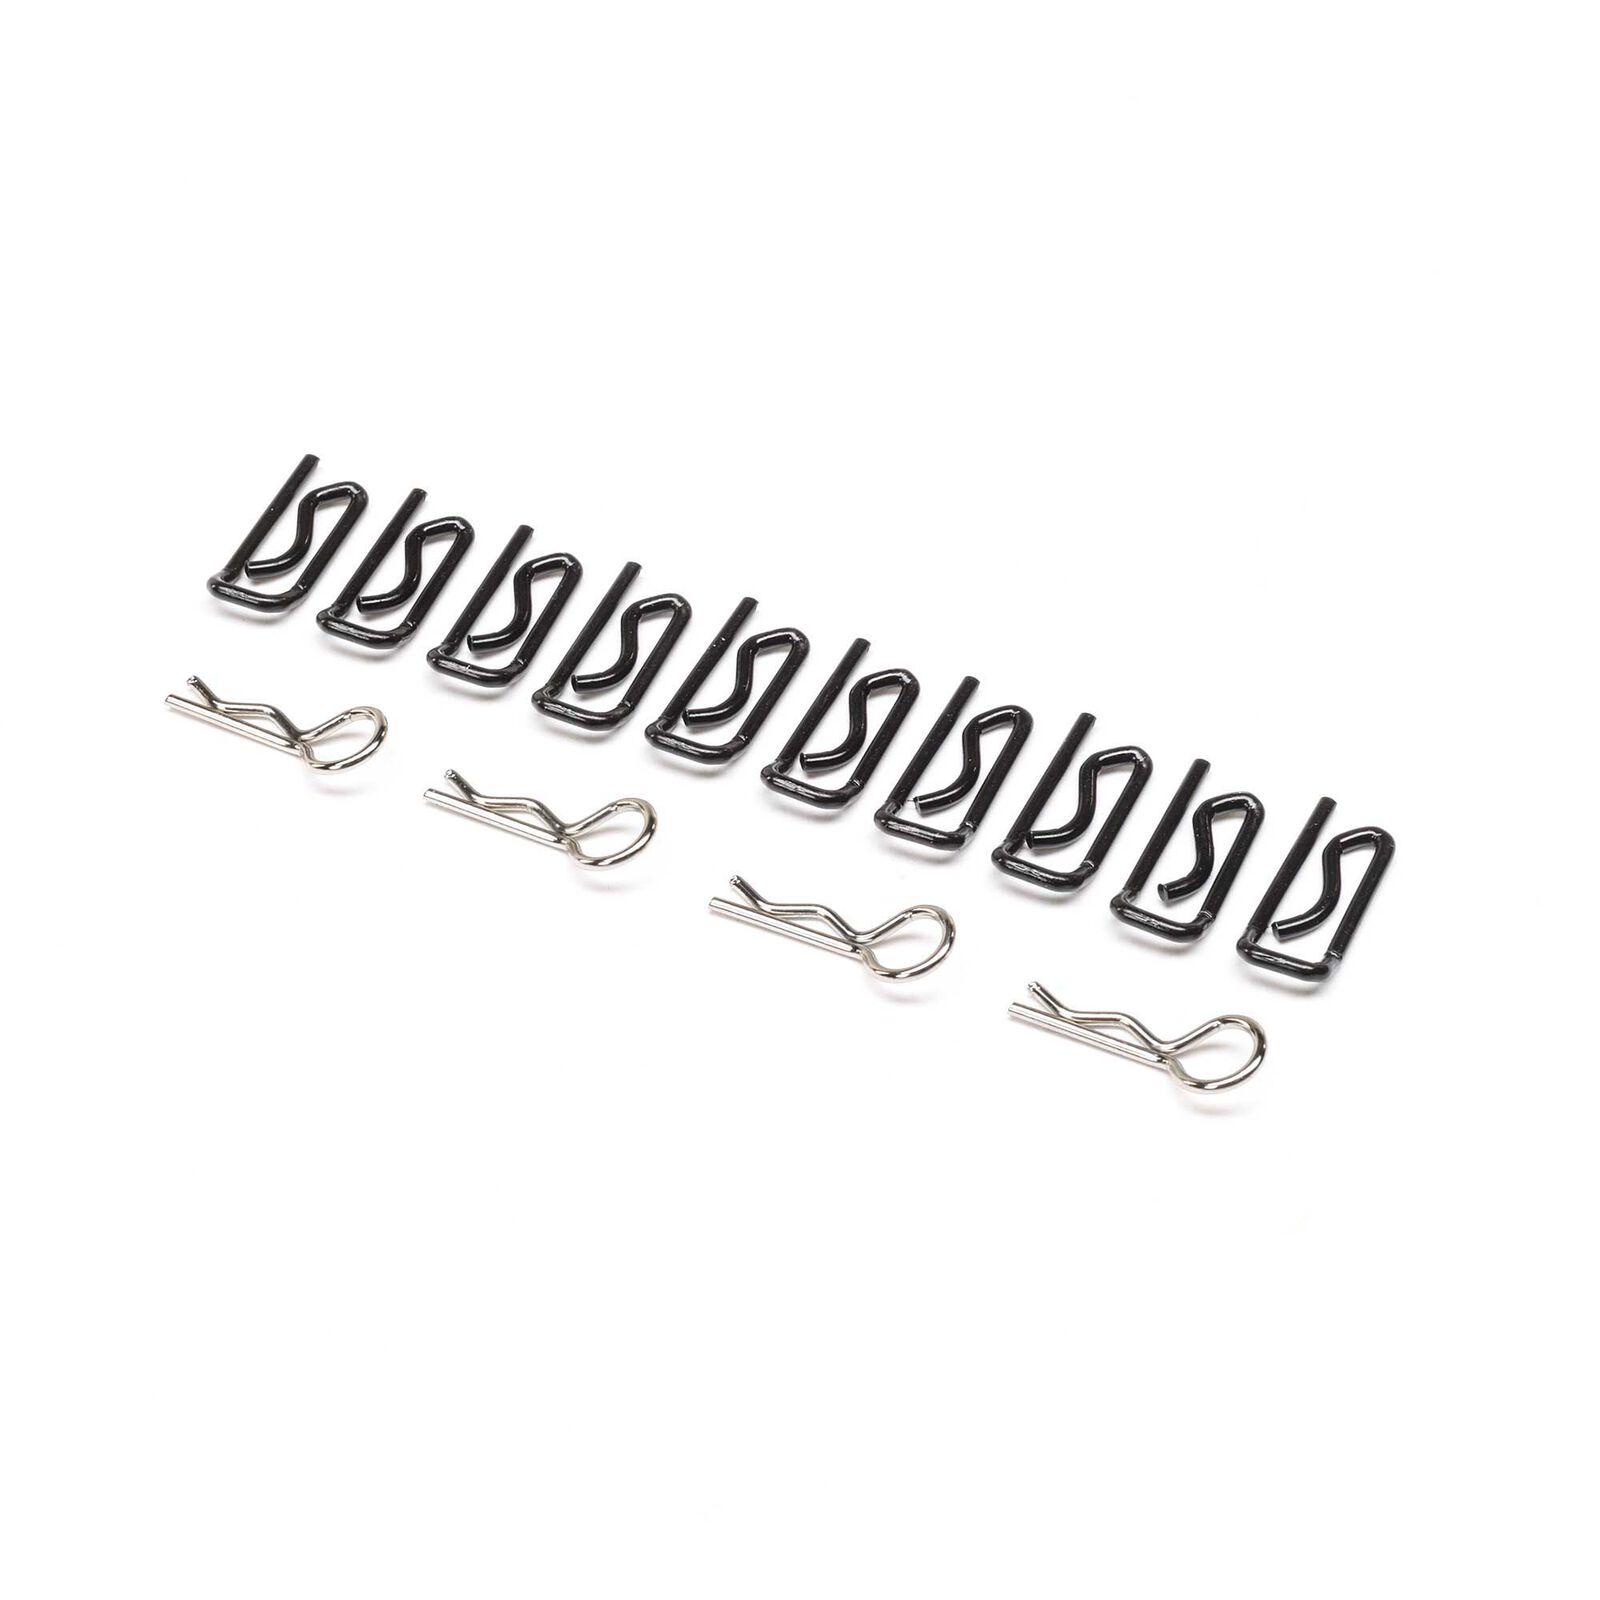 Body Clip, Large (10) & Small (4): 1/5 DB XL